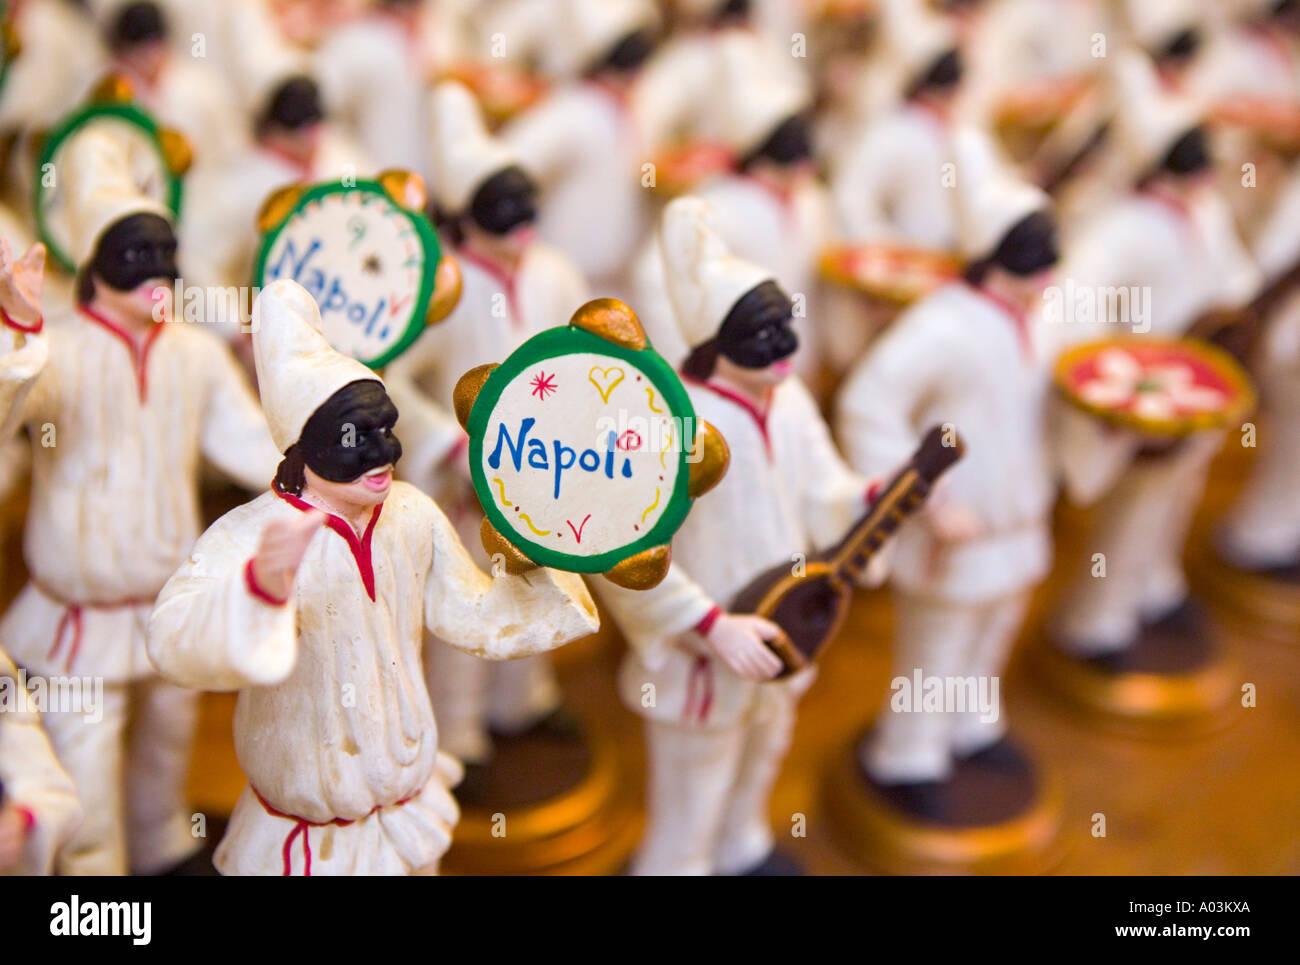 Miniature Figurines, Naples, Campania, Italy - Stock Image